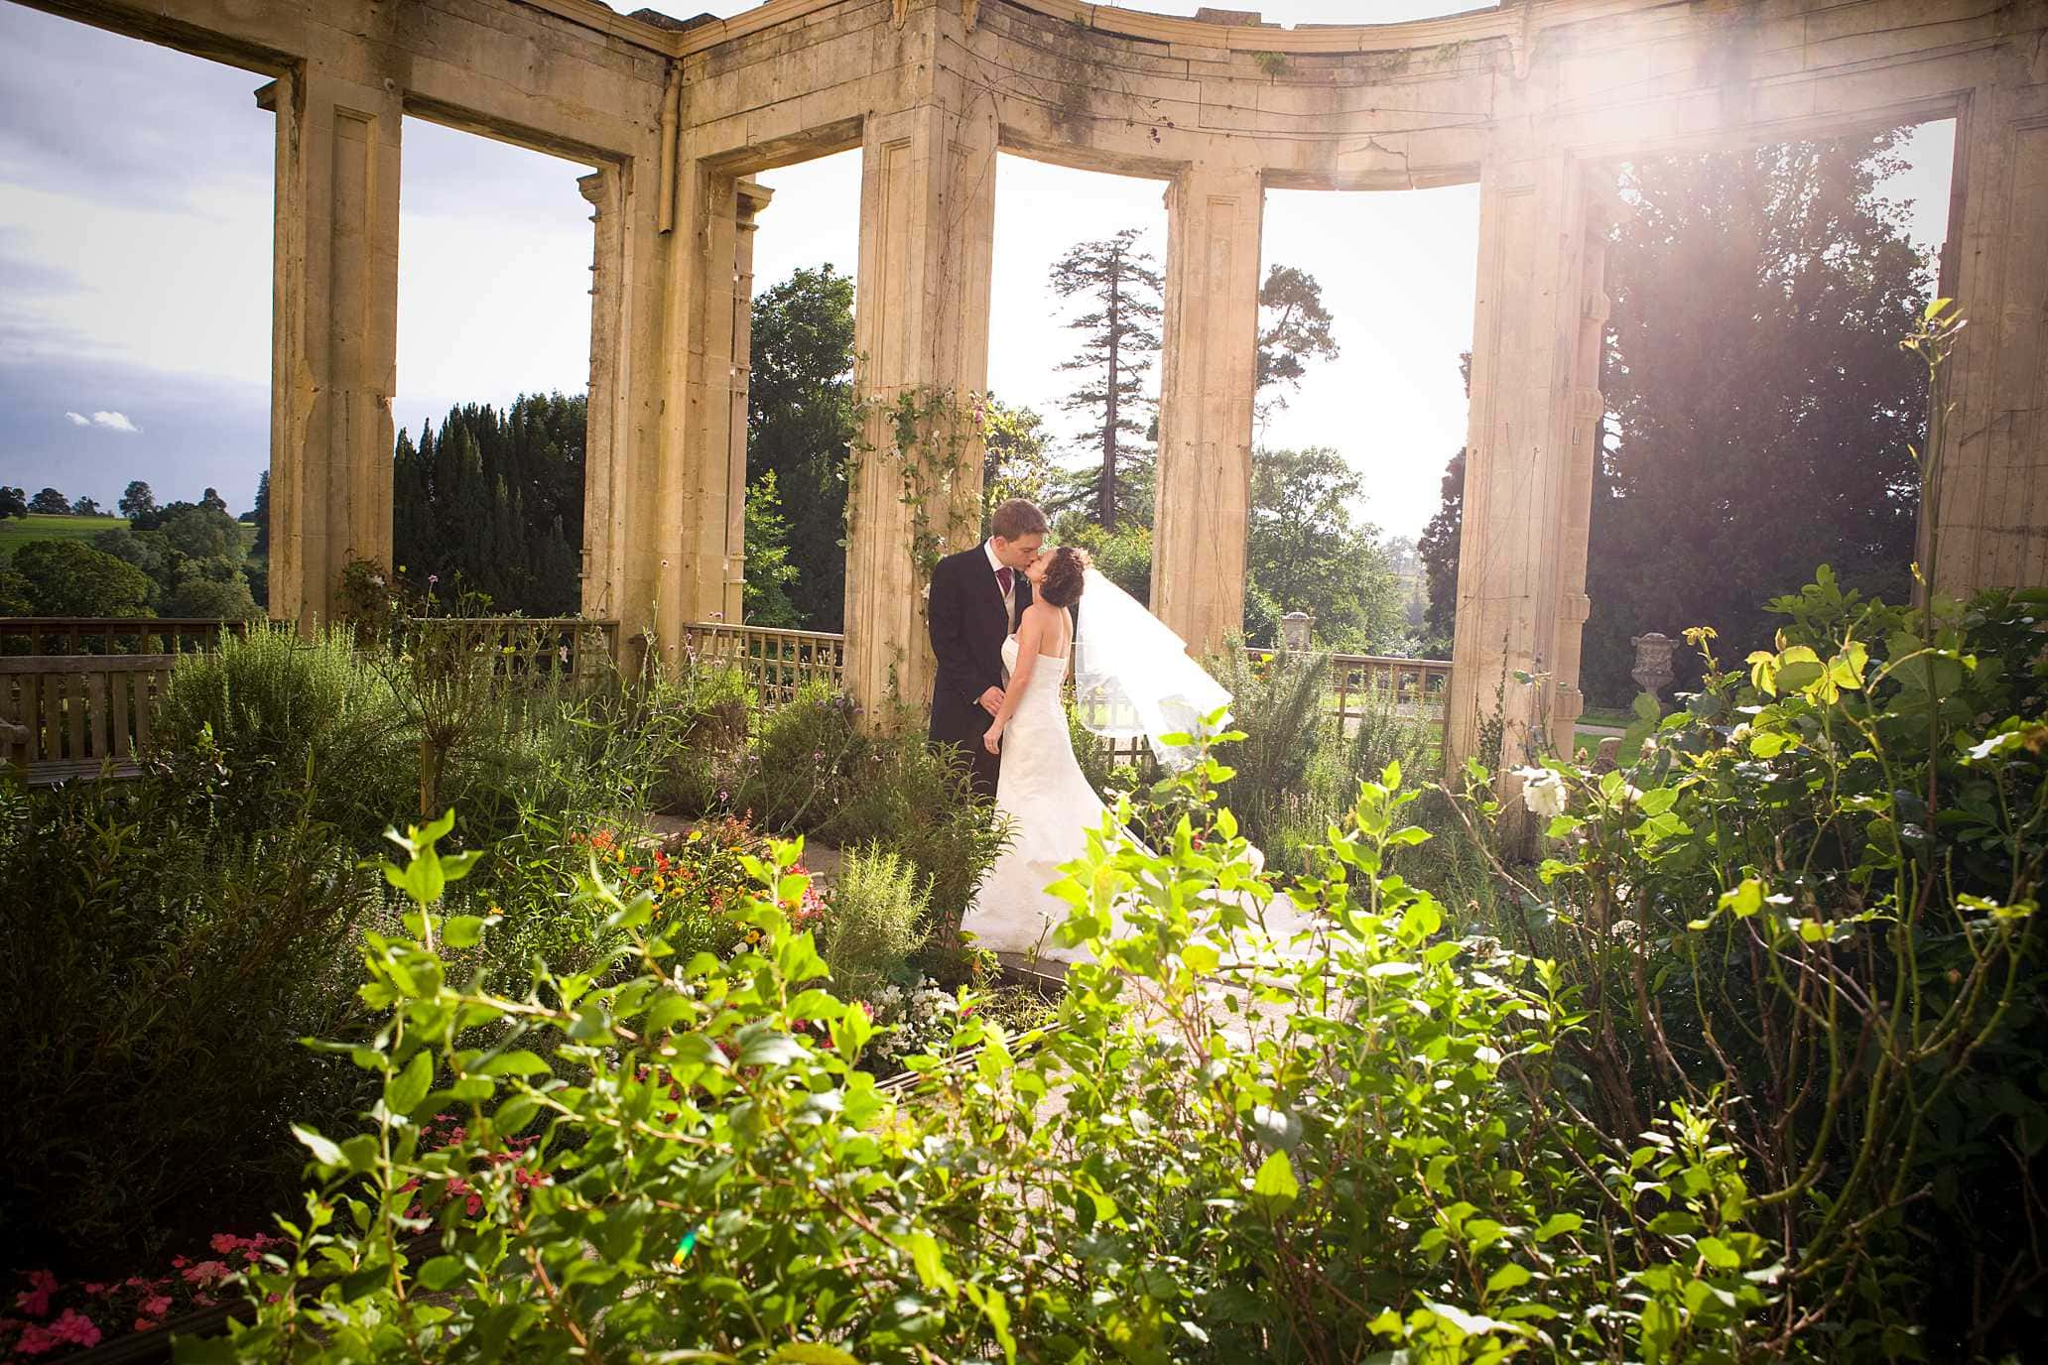 ORCHARDLEIGH HOUSE WEDDING PHOTOGRAPHER | MARISH & HARRY